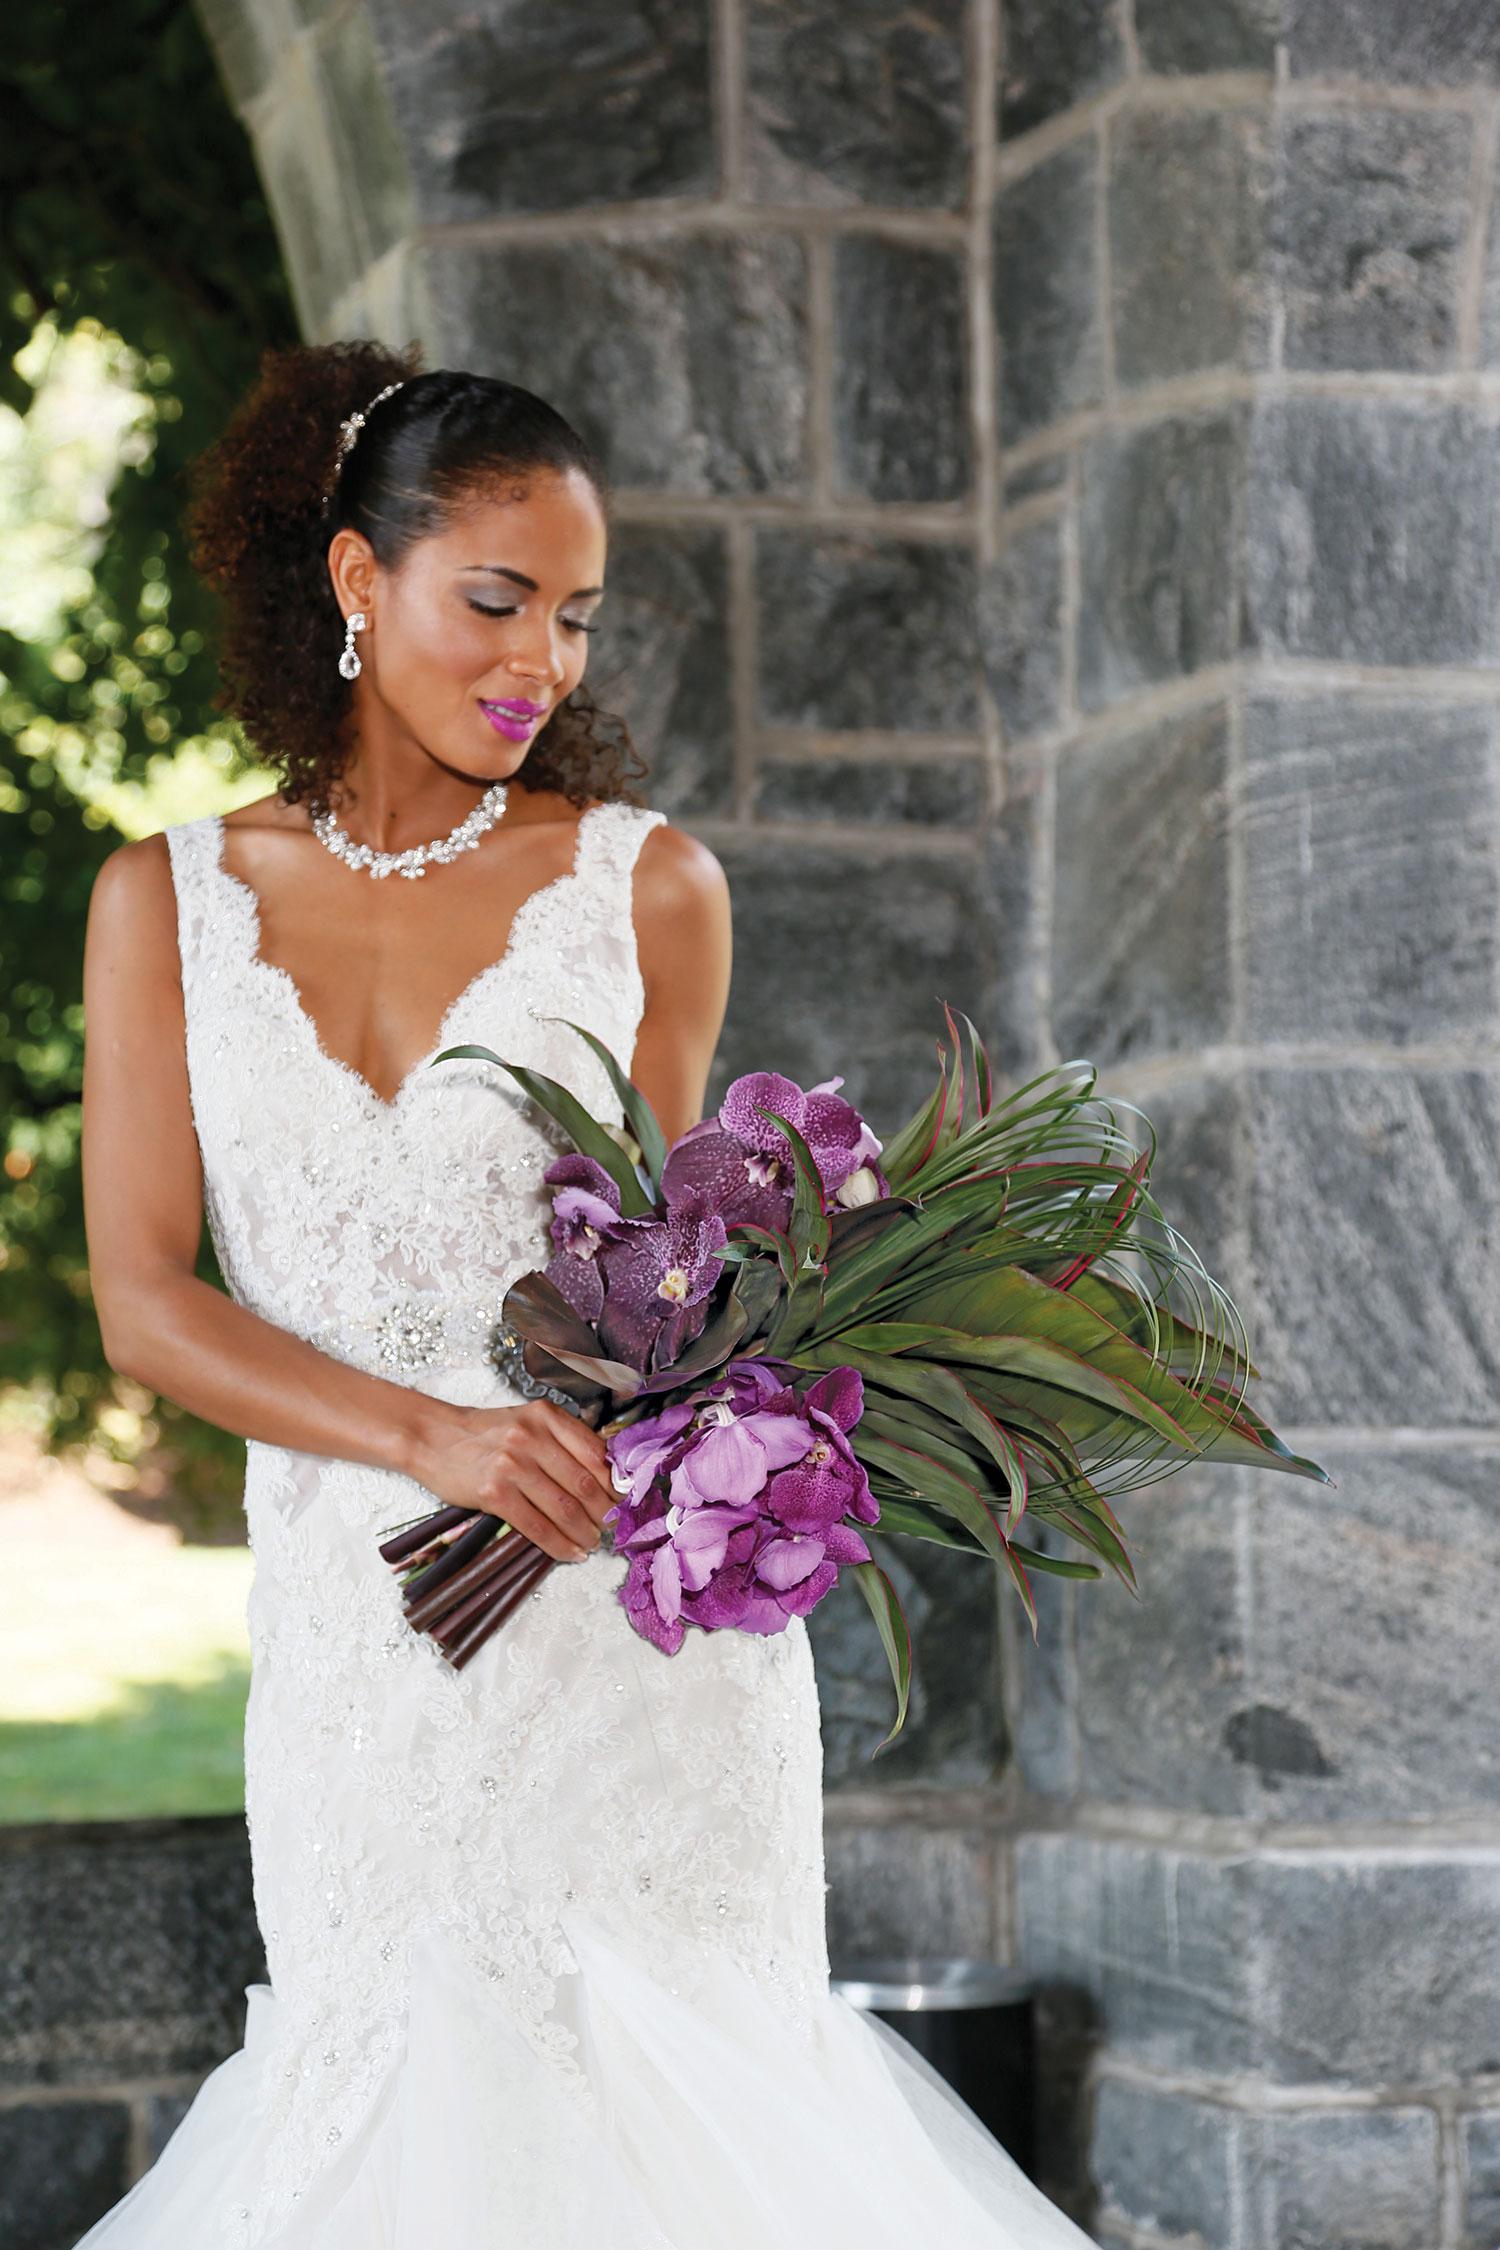 As seen in Manhattan Bride